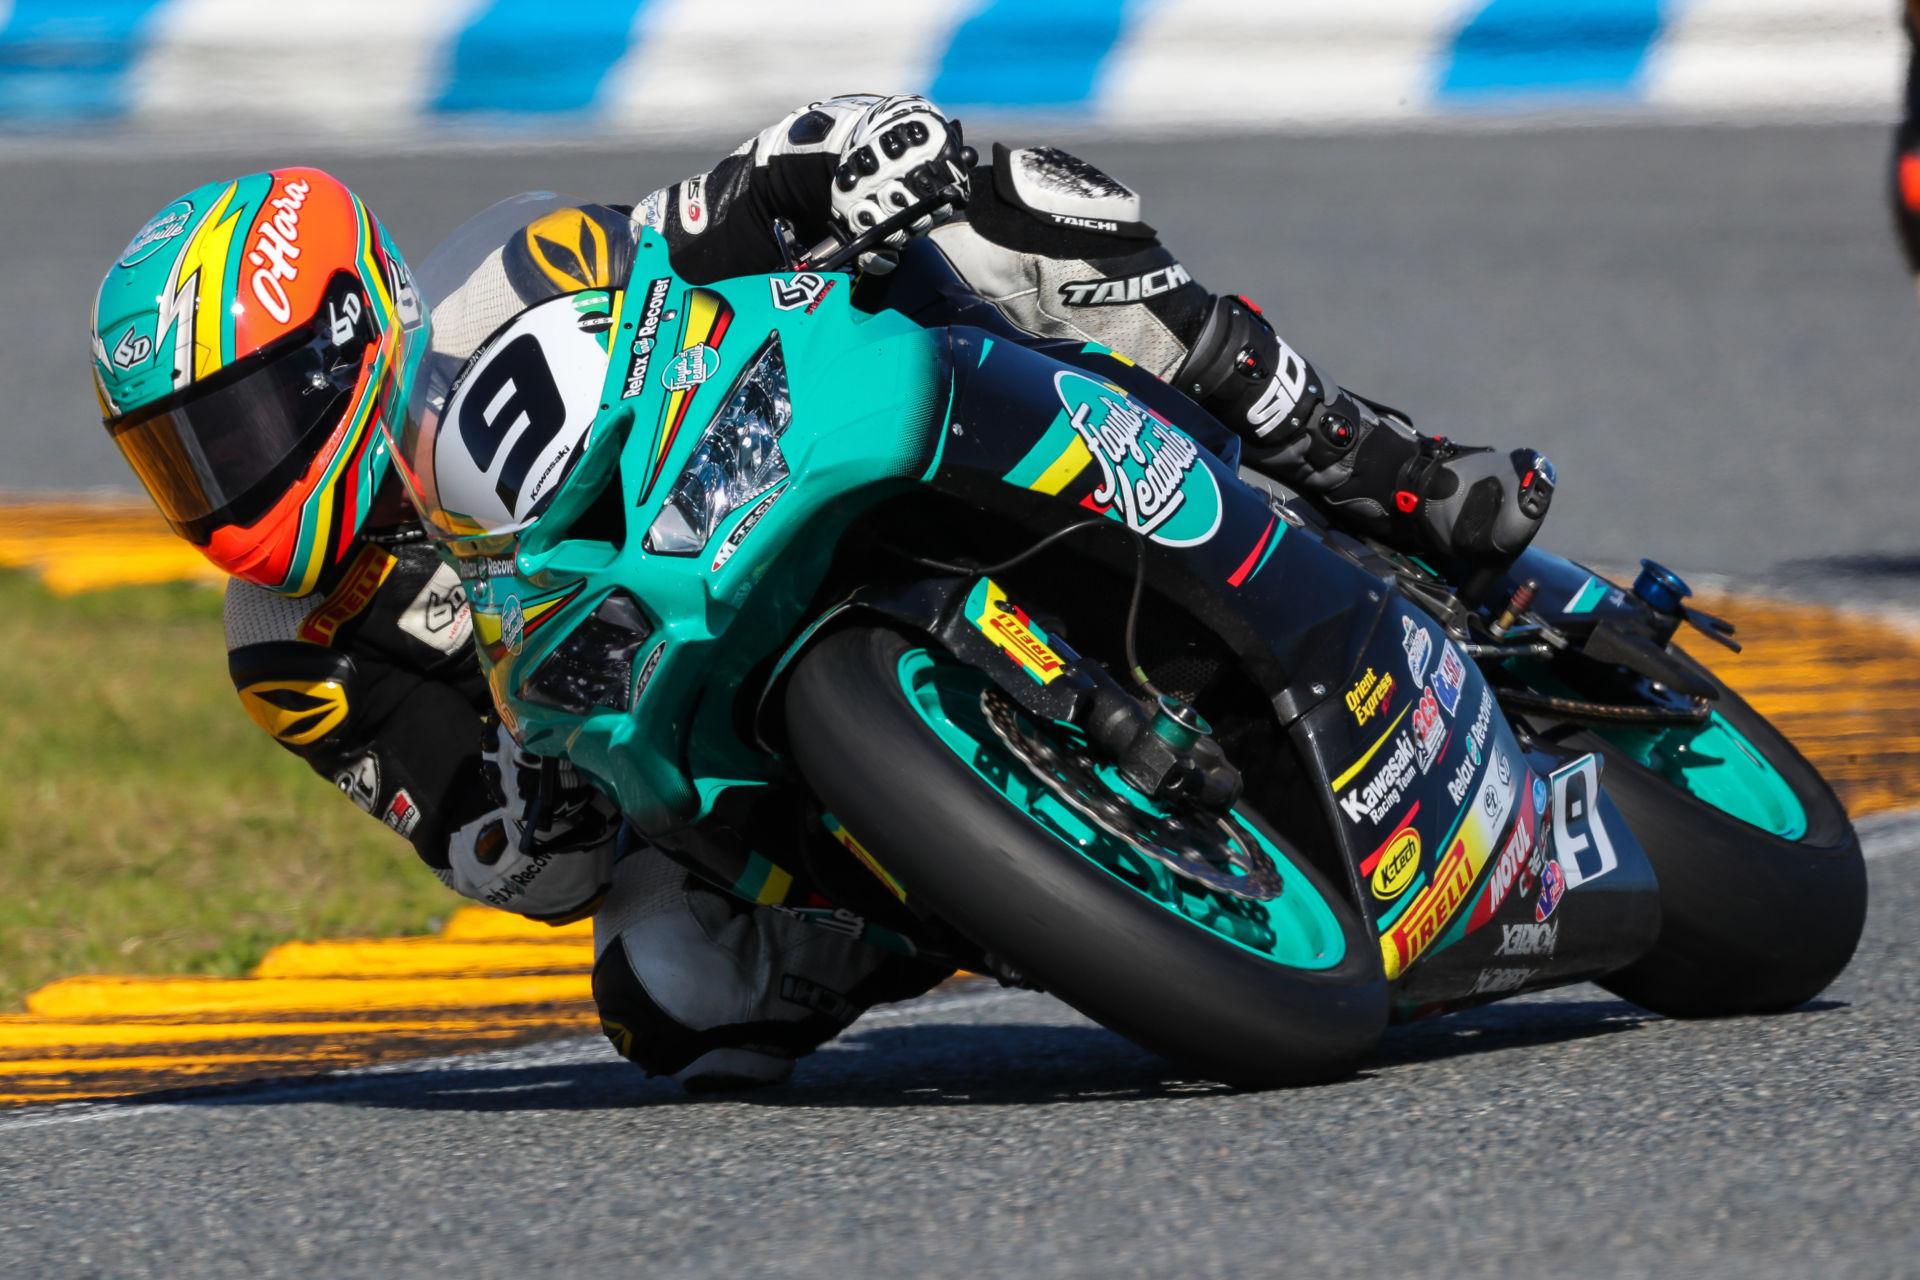 Pirelli-sponsored racer Tyler O'Hara. Photo by Brian J. Nelson, courtesy Pirelli.